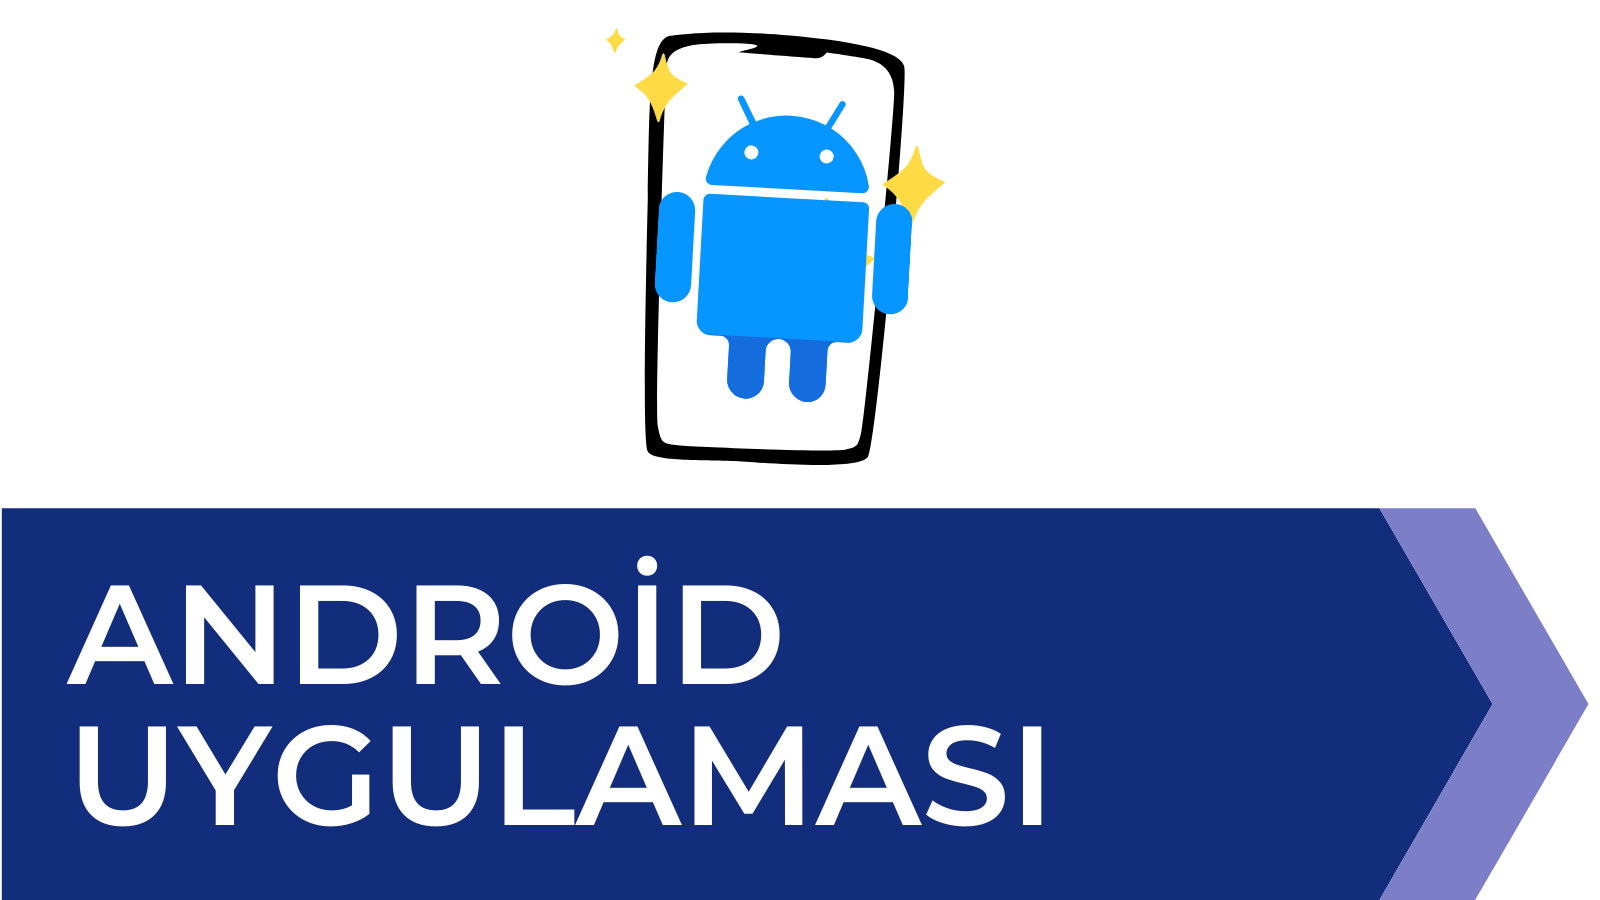 Android Uygulaması kapak